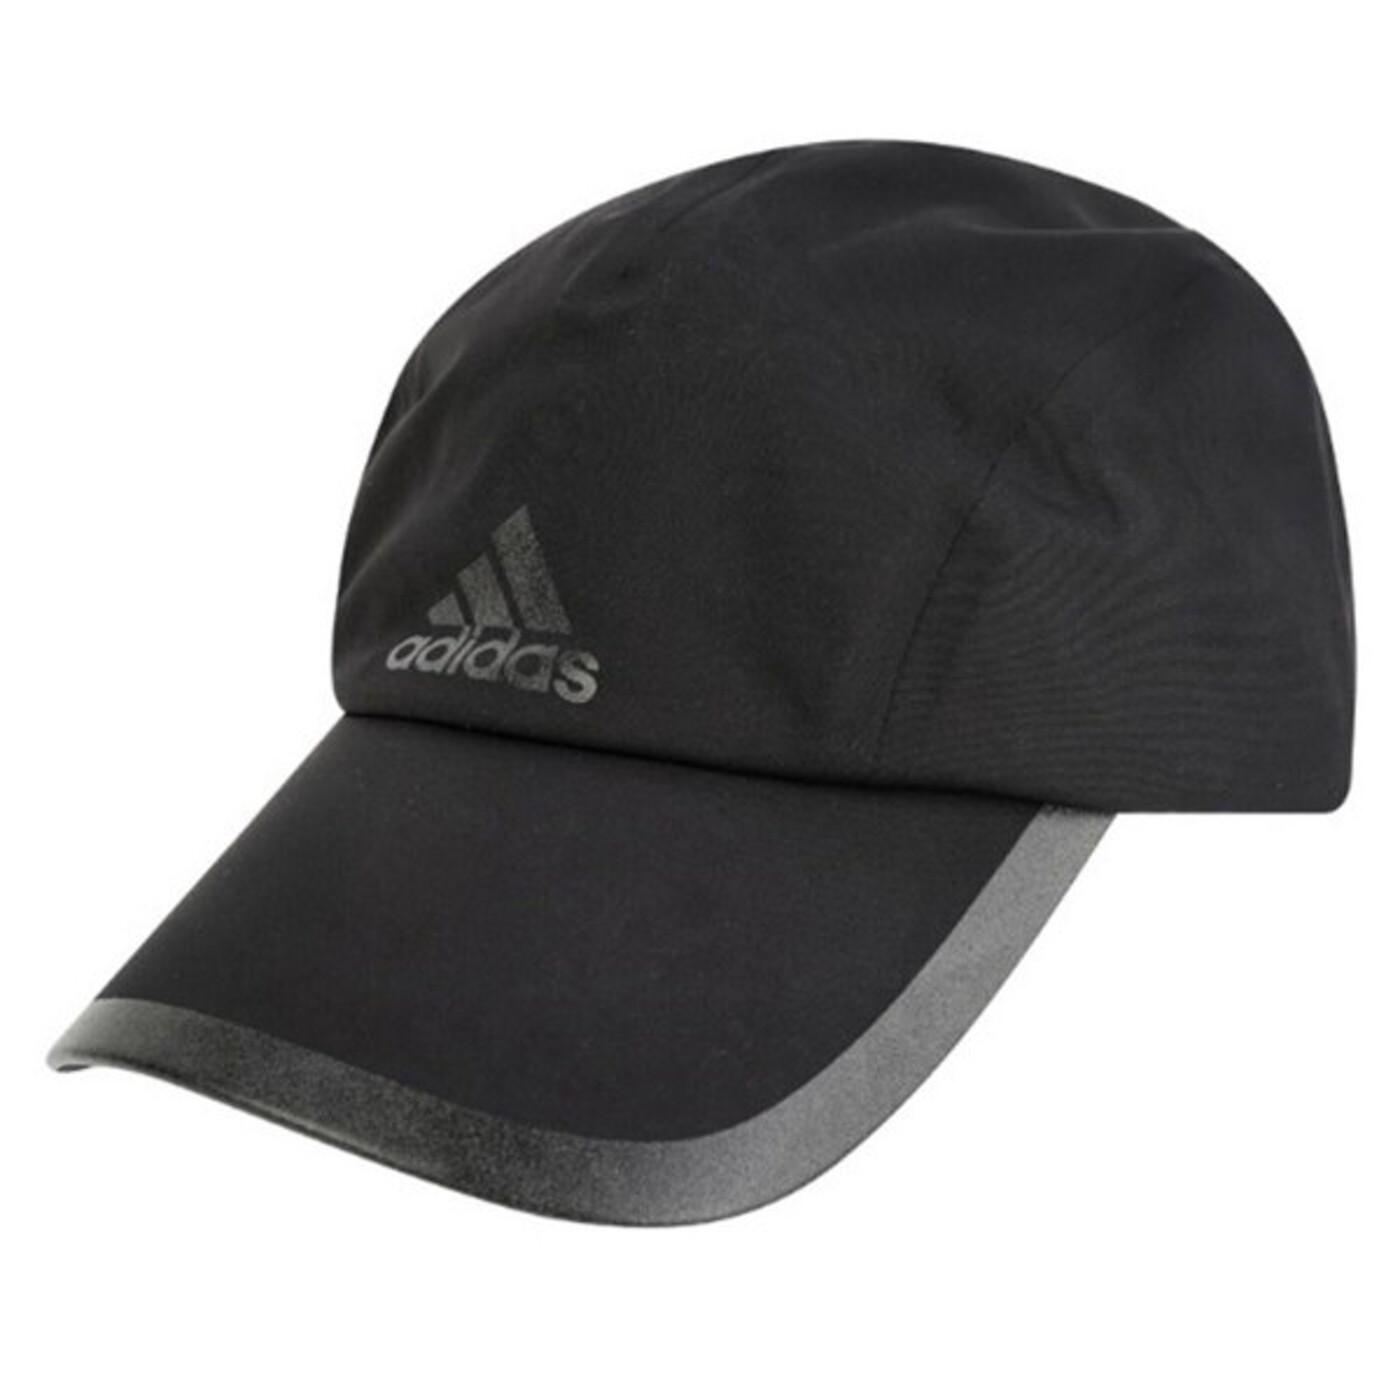 ADIDAS R96 CP CAP - Herren